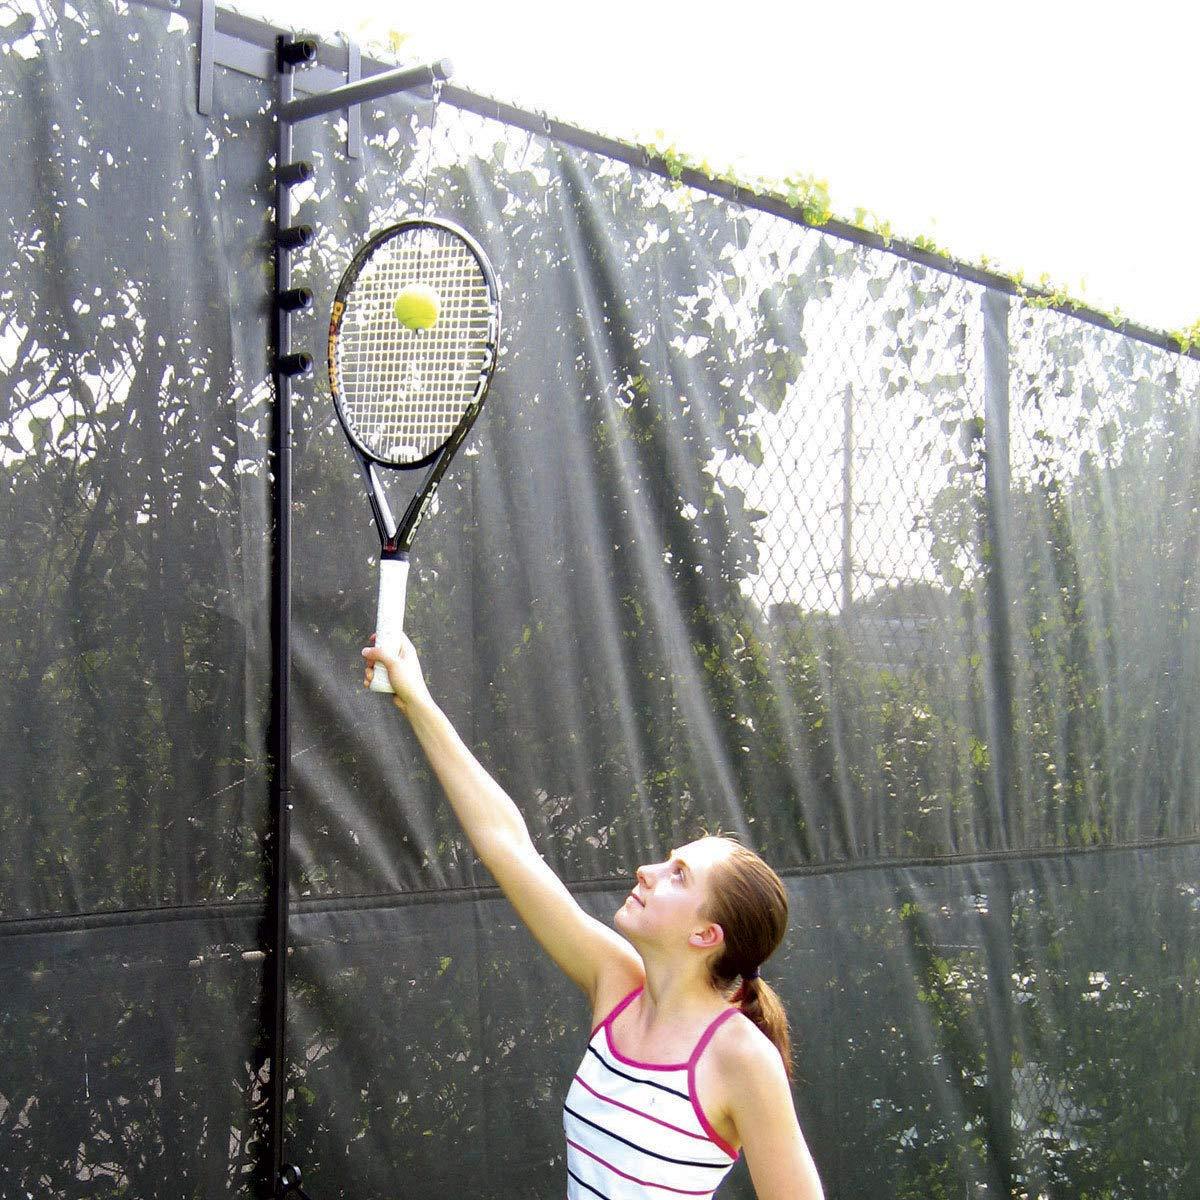 Oncourt Offcourt Fence Trainer - Tennis Training Aid